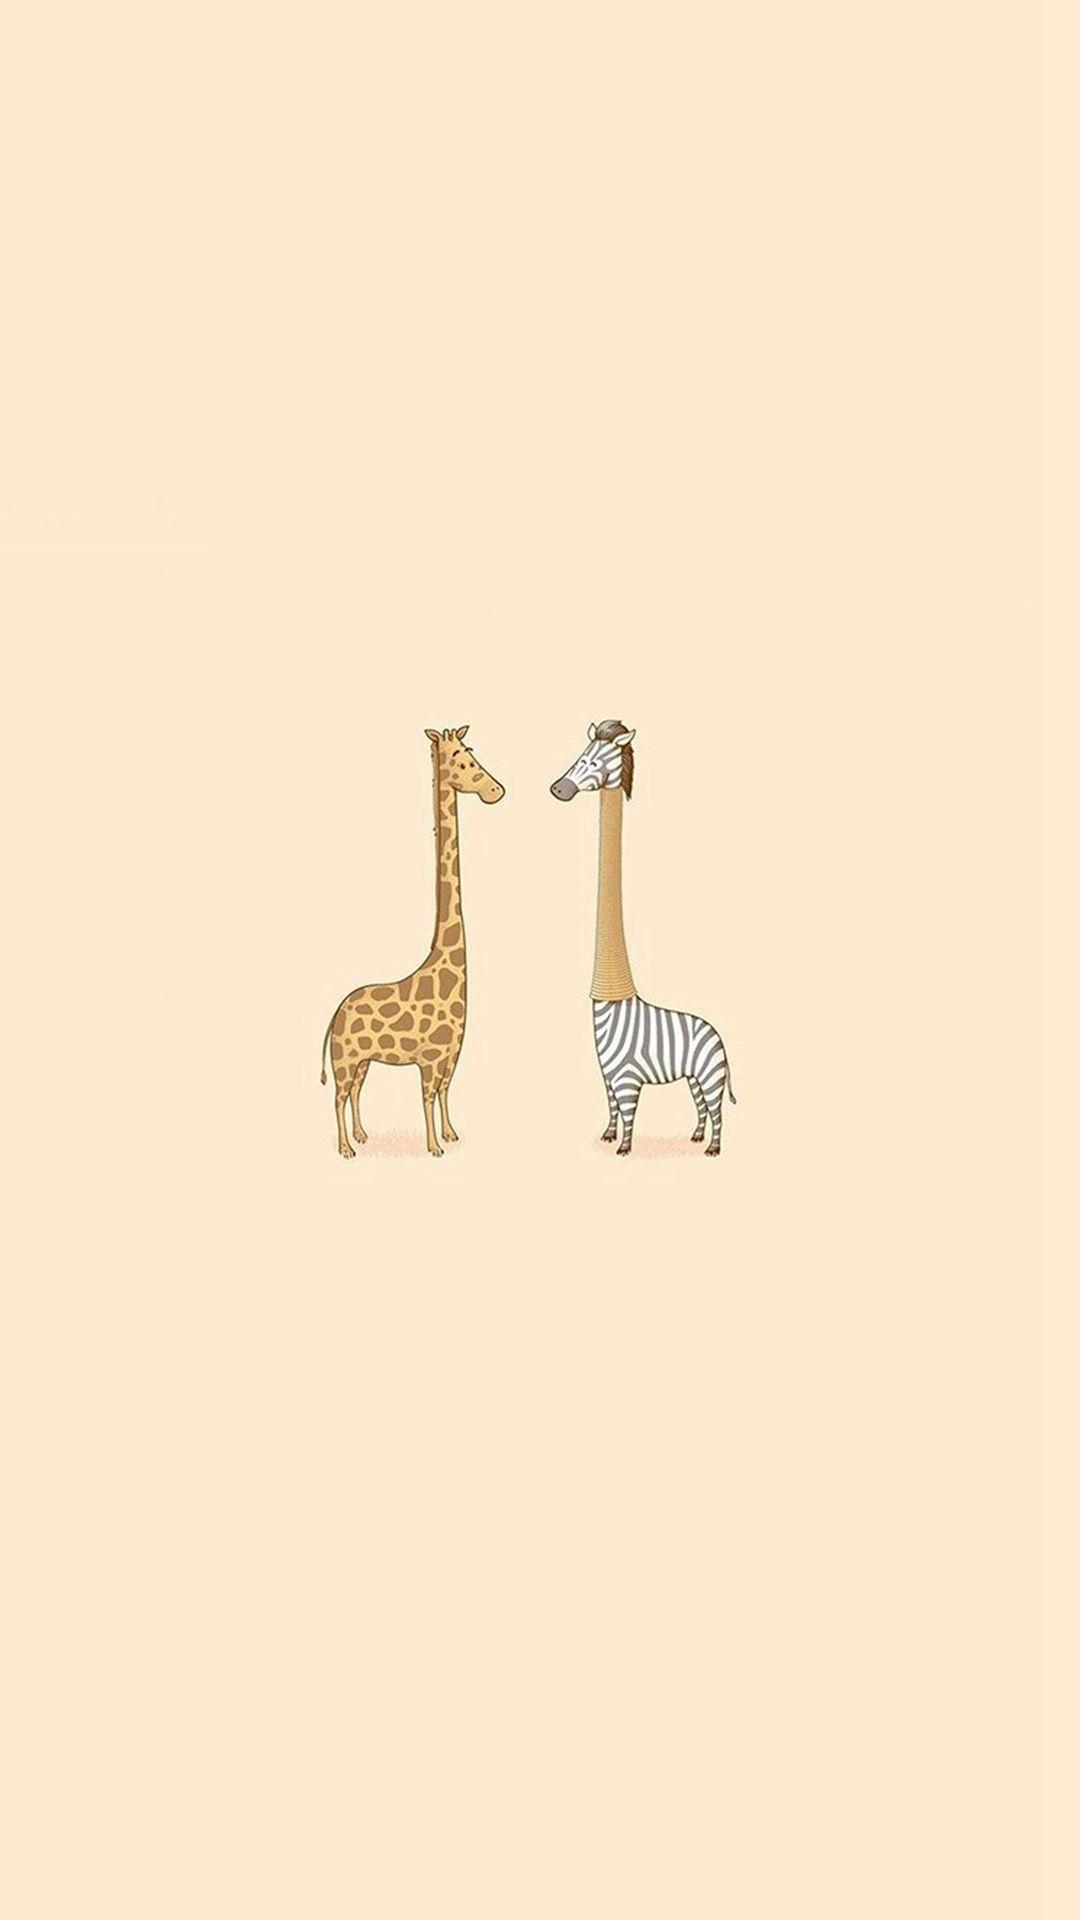 Animal Wallpapers Iphone Wallpapers Wild Animal Wallpaper Animal Wallpaper Majestic Animals